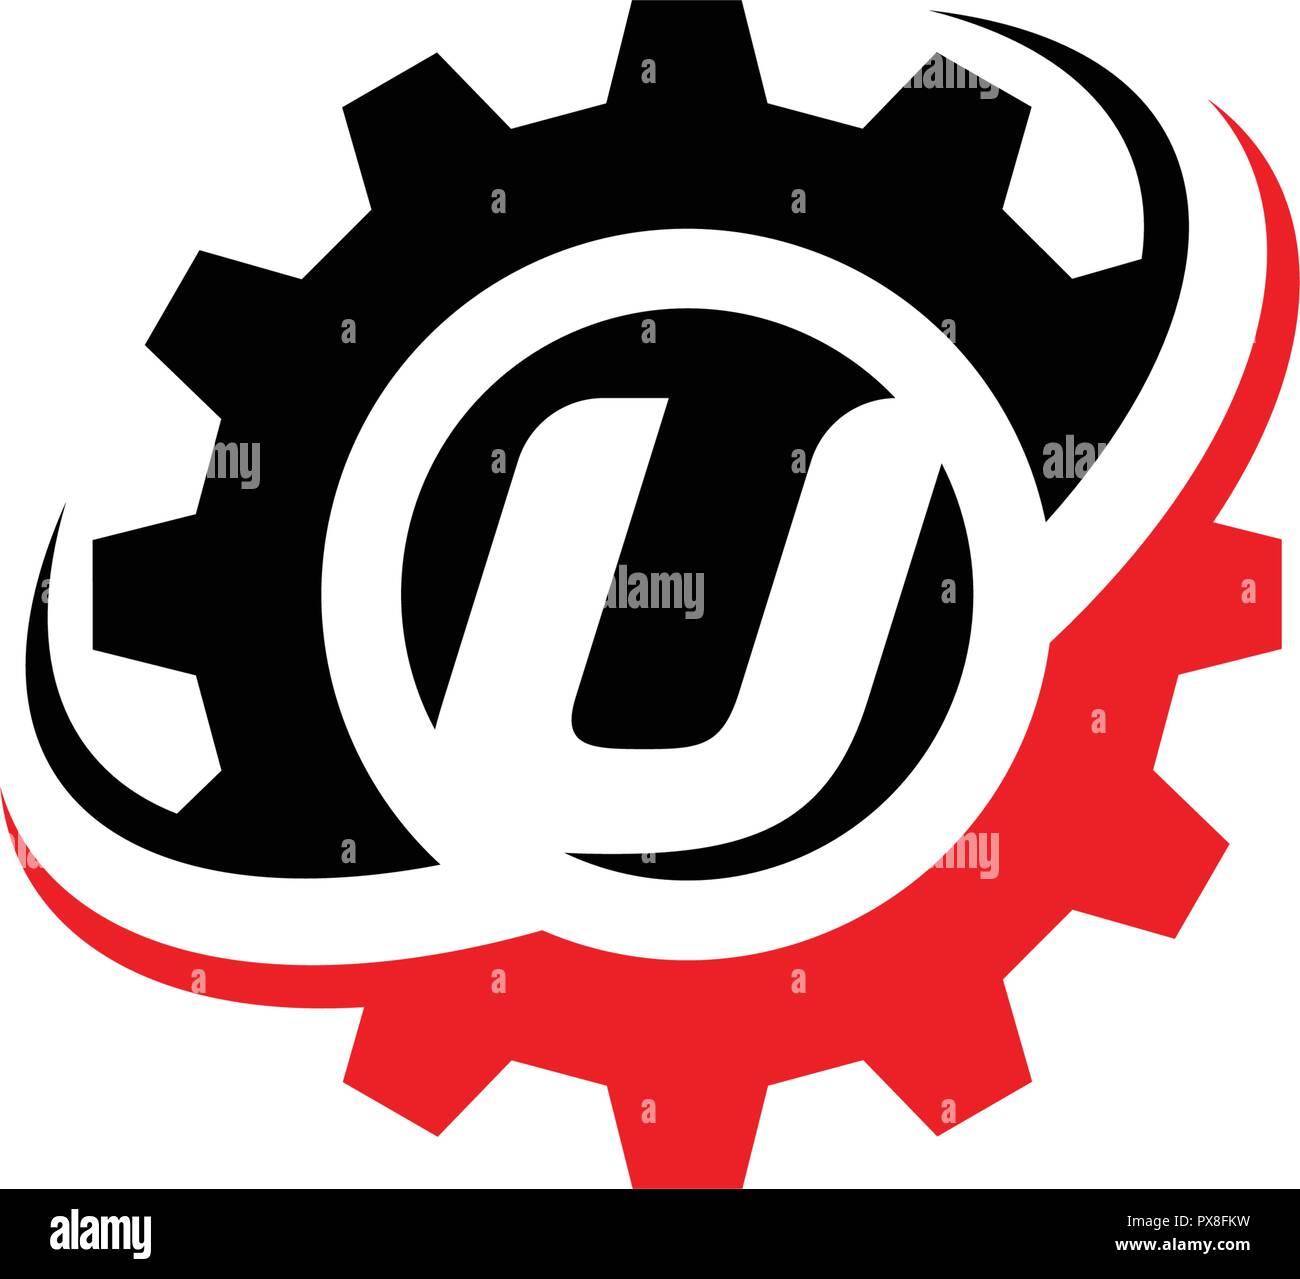 Letter U Gear Logo Design Template Stock Vector Art Illustration